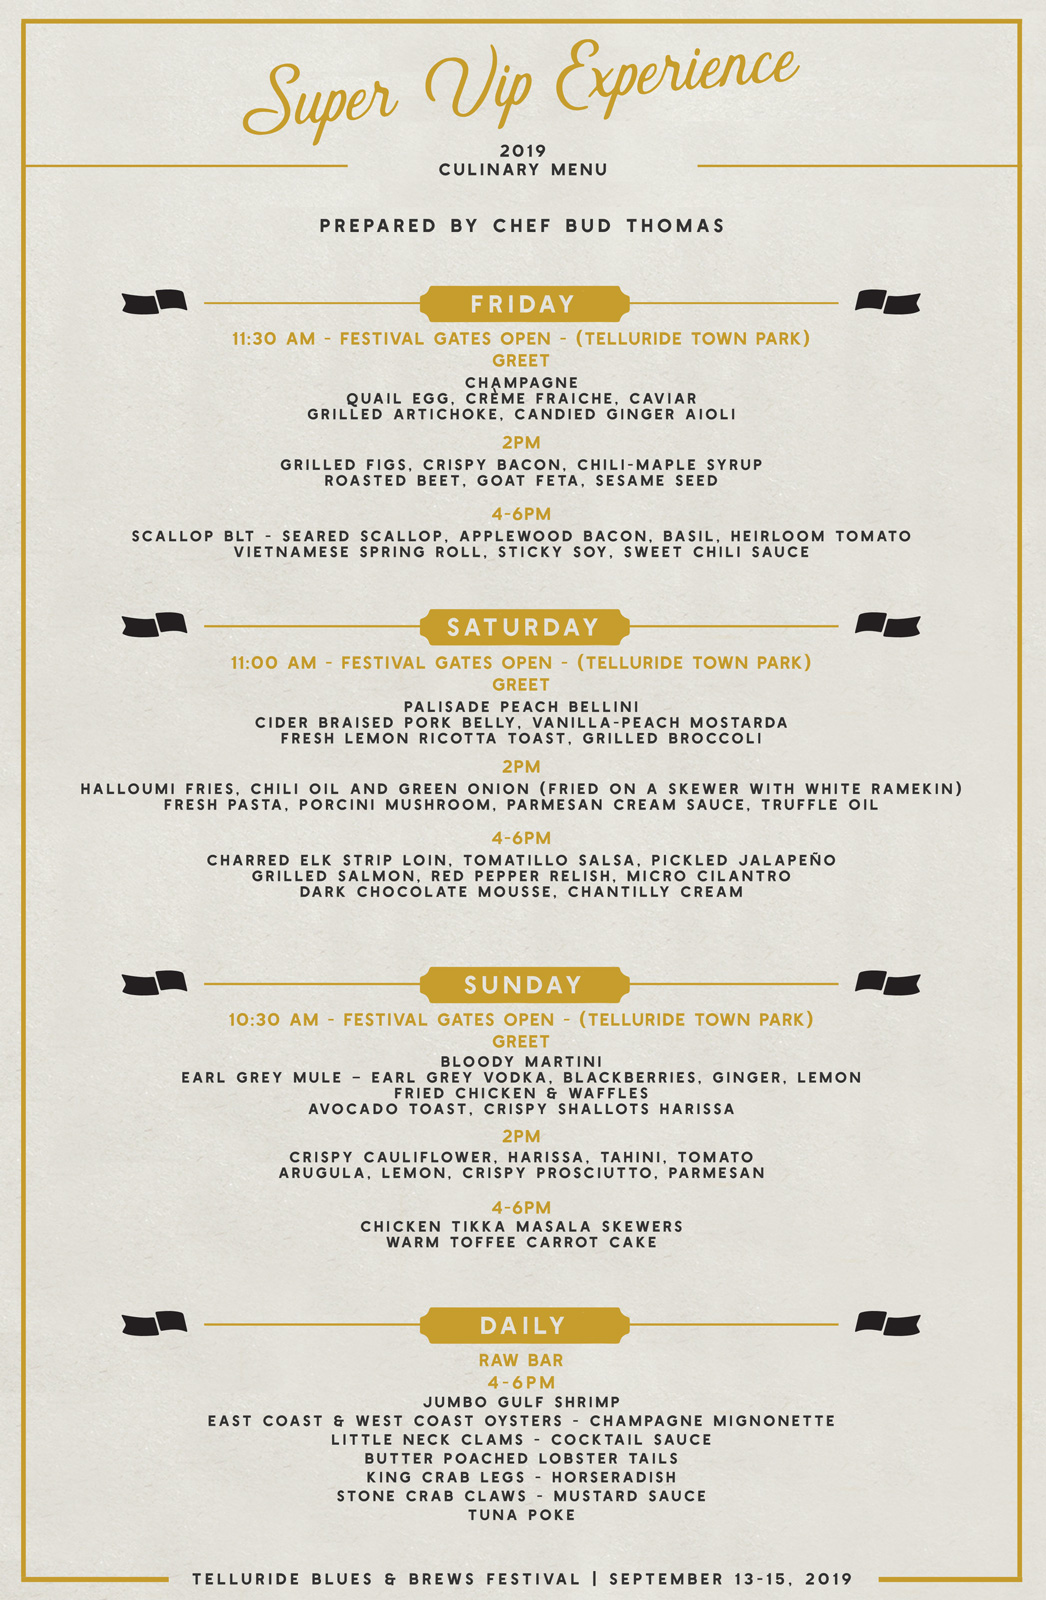 Telluride Blues & Brews Festival | Super VIP Show Cooking Menu